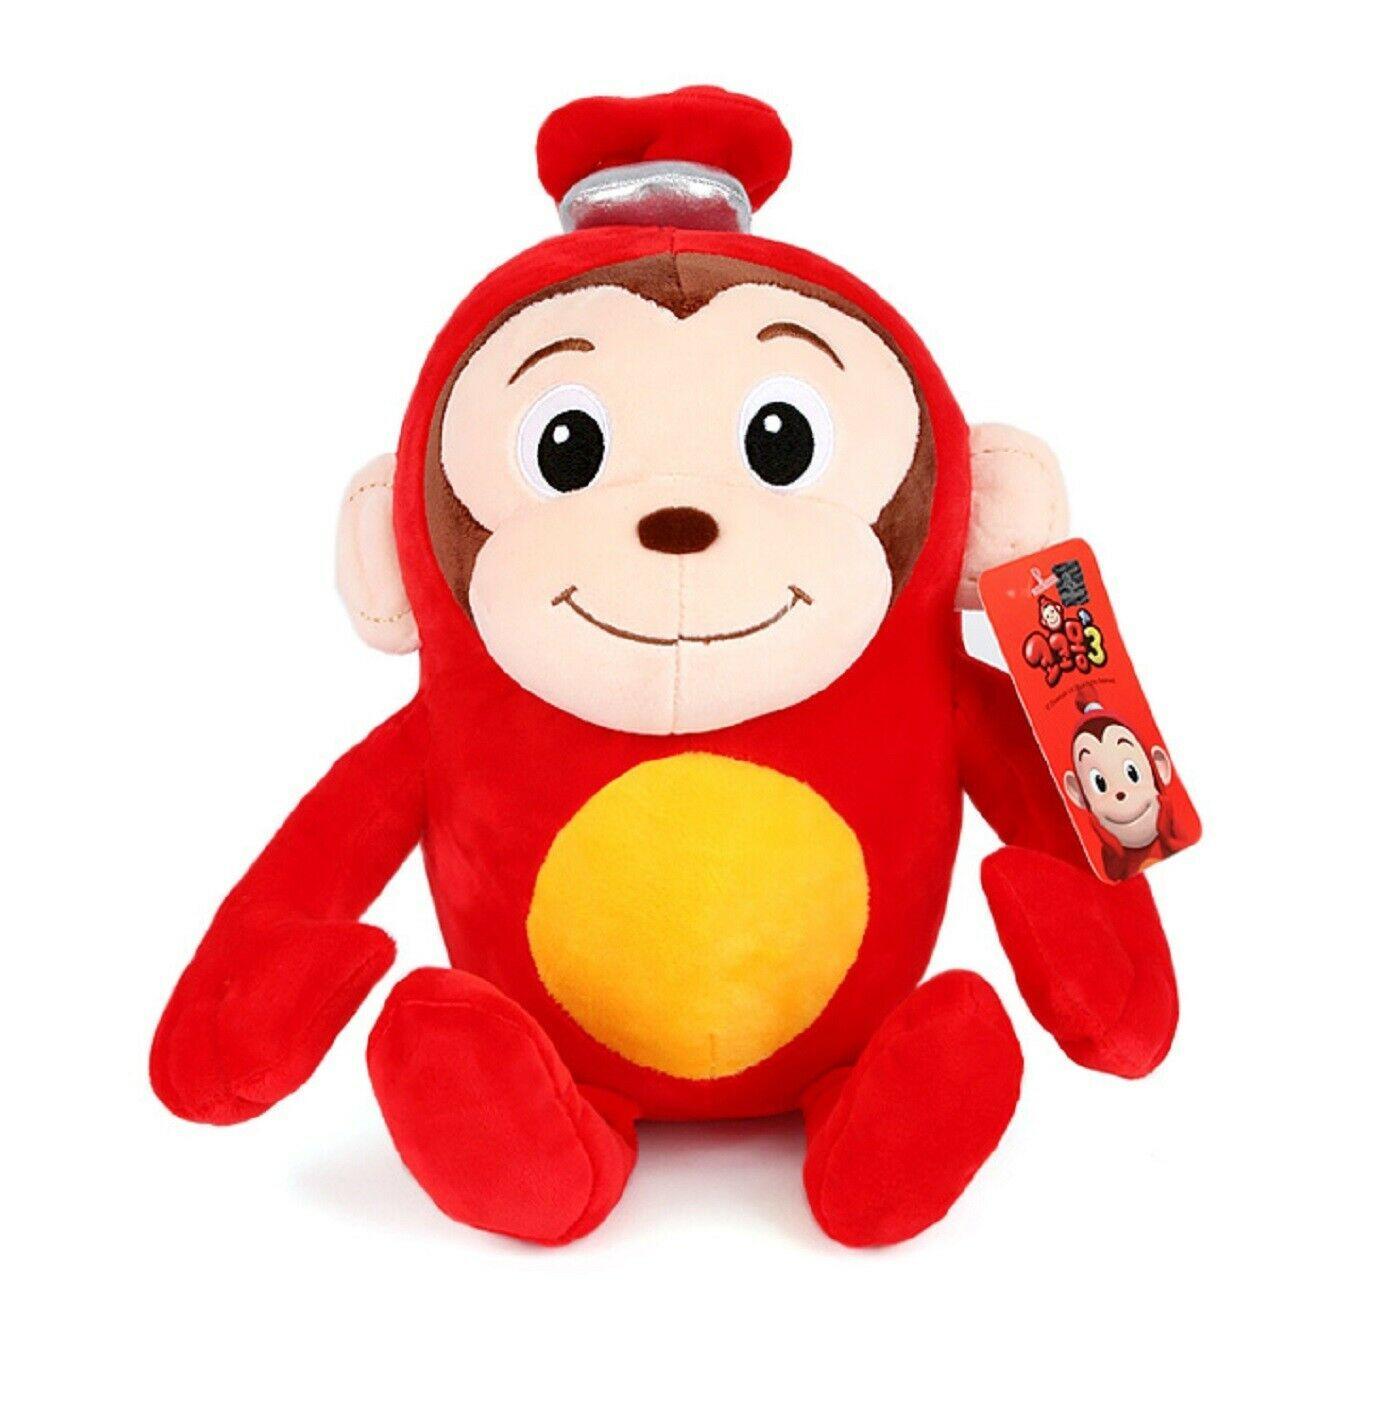 "Toy Trons Coco Mong Stuffed Animal Monkey Plush Toy 9.85"" 25cm"